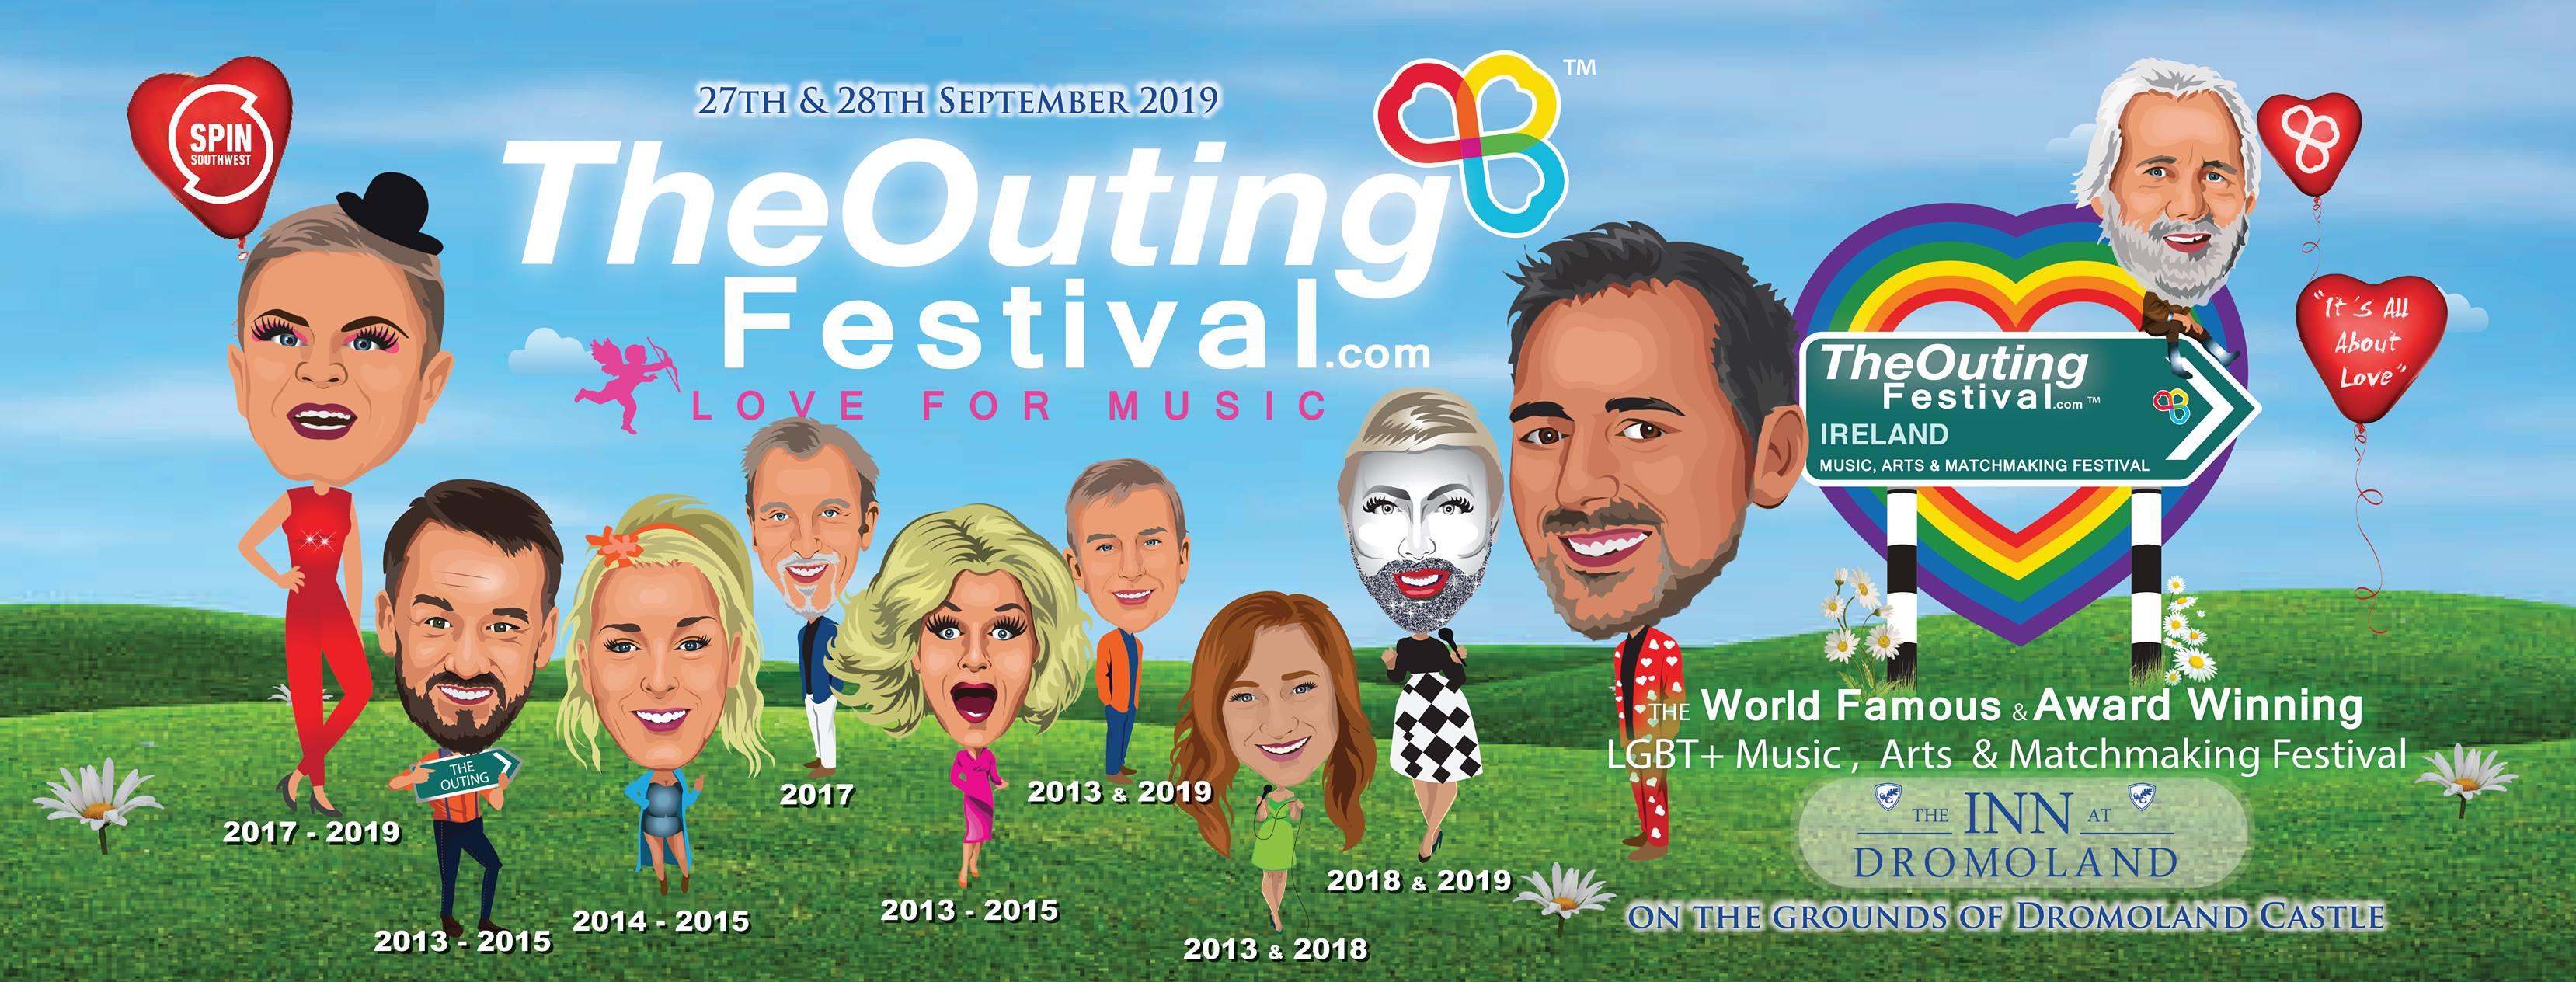 Matchmaking Festival 2013